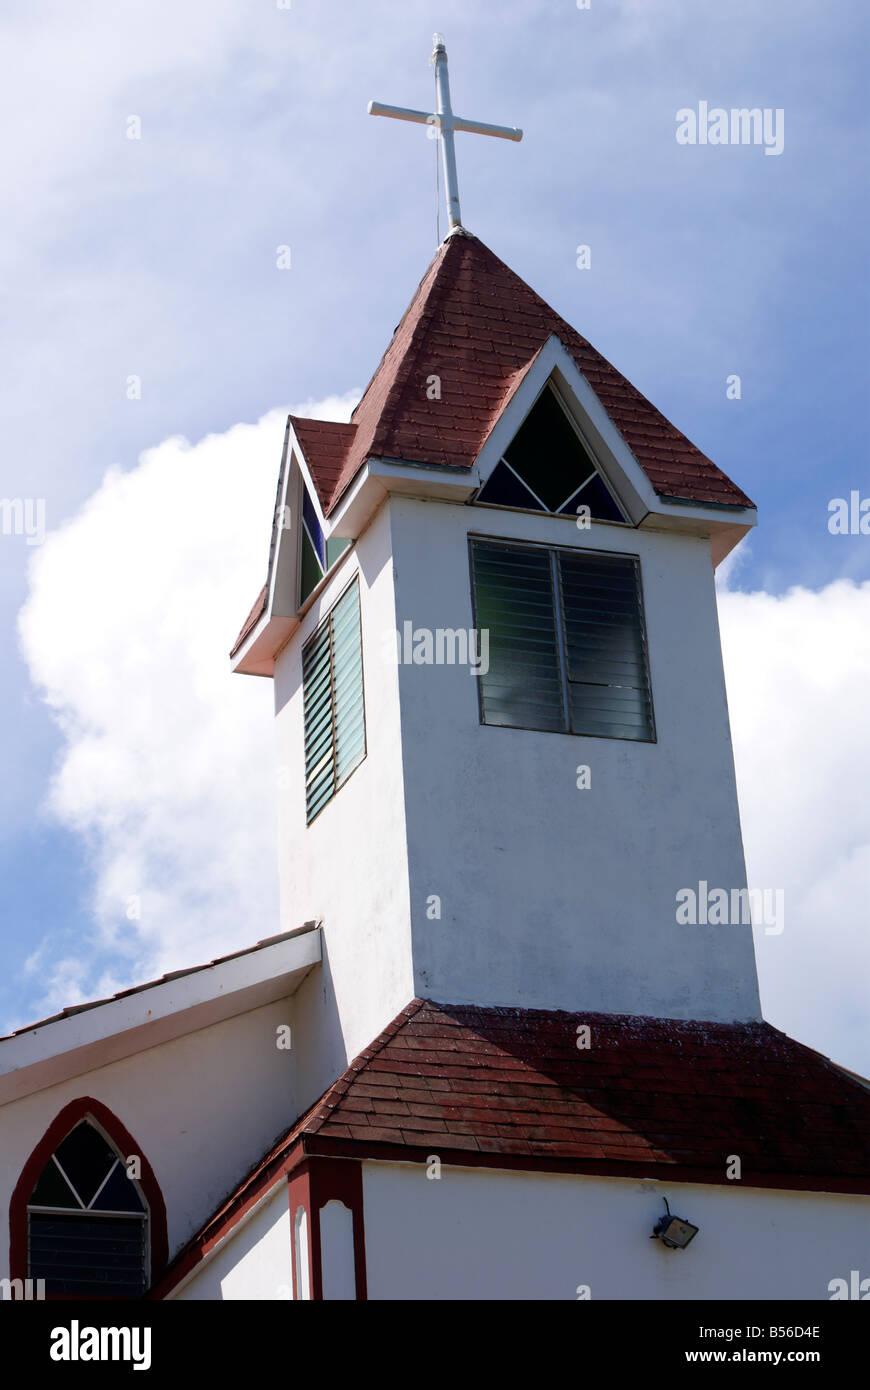 Ebeneezer Baptist Church en Big Corn Island, Nicaragua, Centroamérica Foto de stock